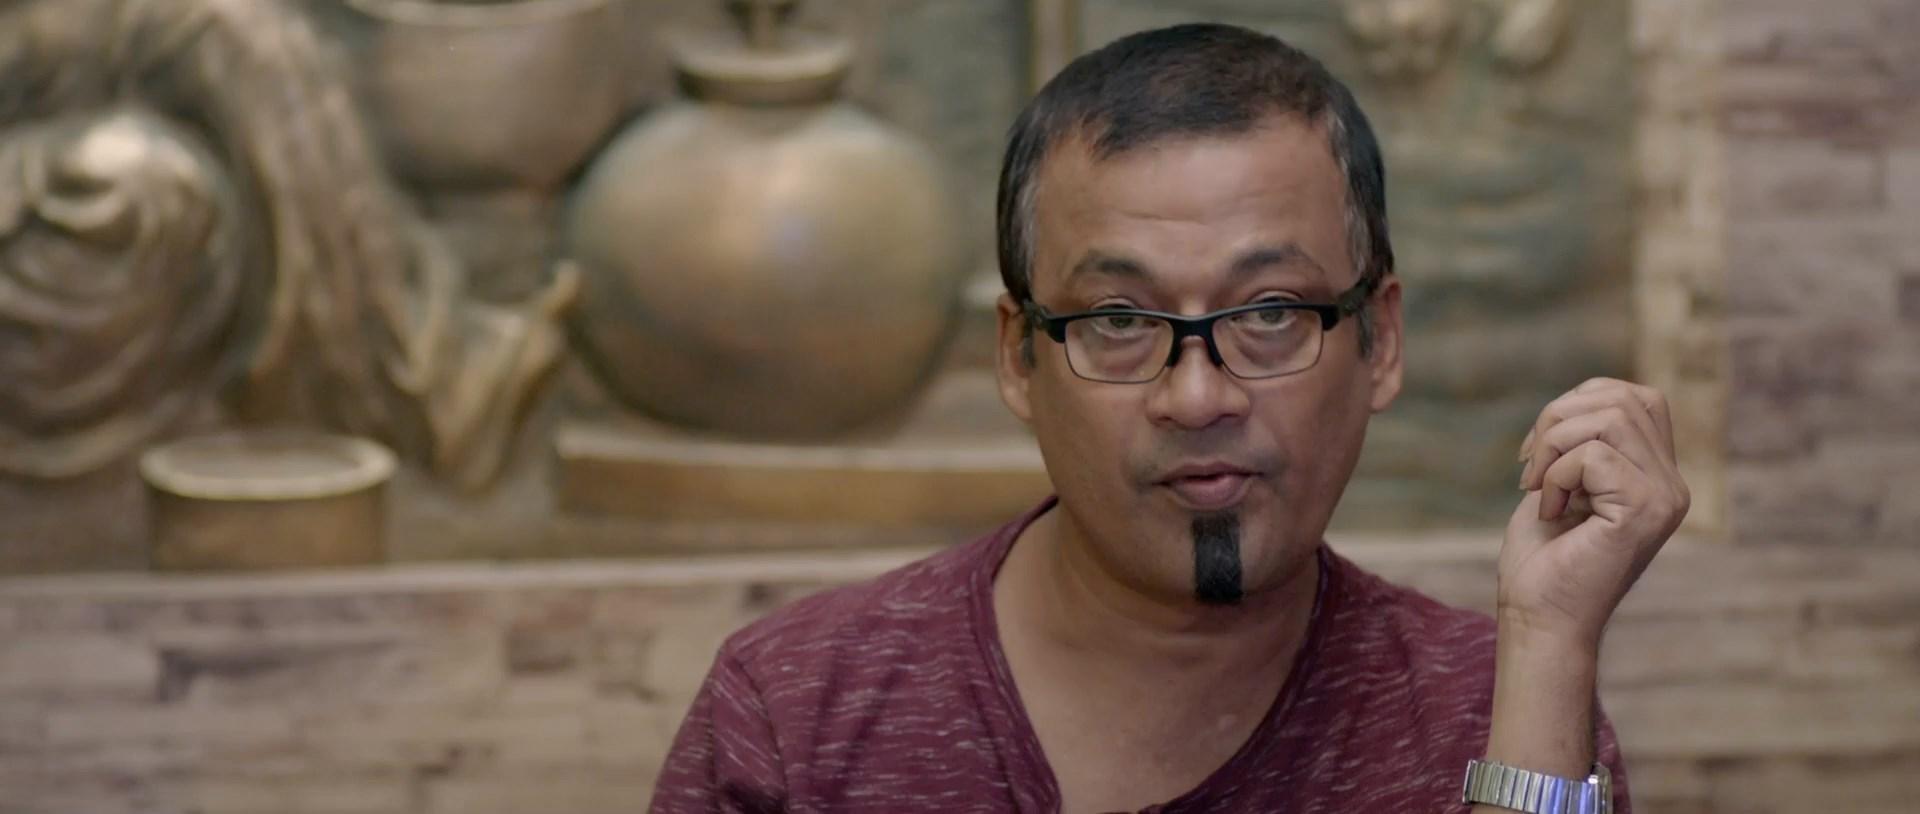 KAYA The Mystery Unfolds 2021 Bengali Movie 1080p WEB DL x264 AAC.mp4 snapshot 00.10.43.708